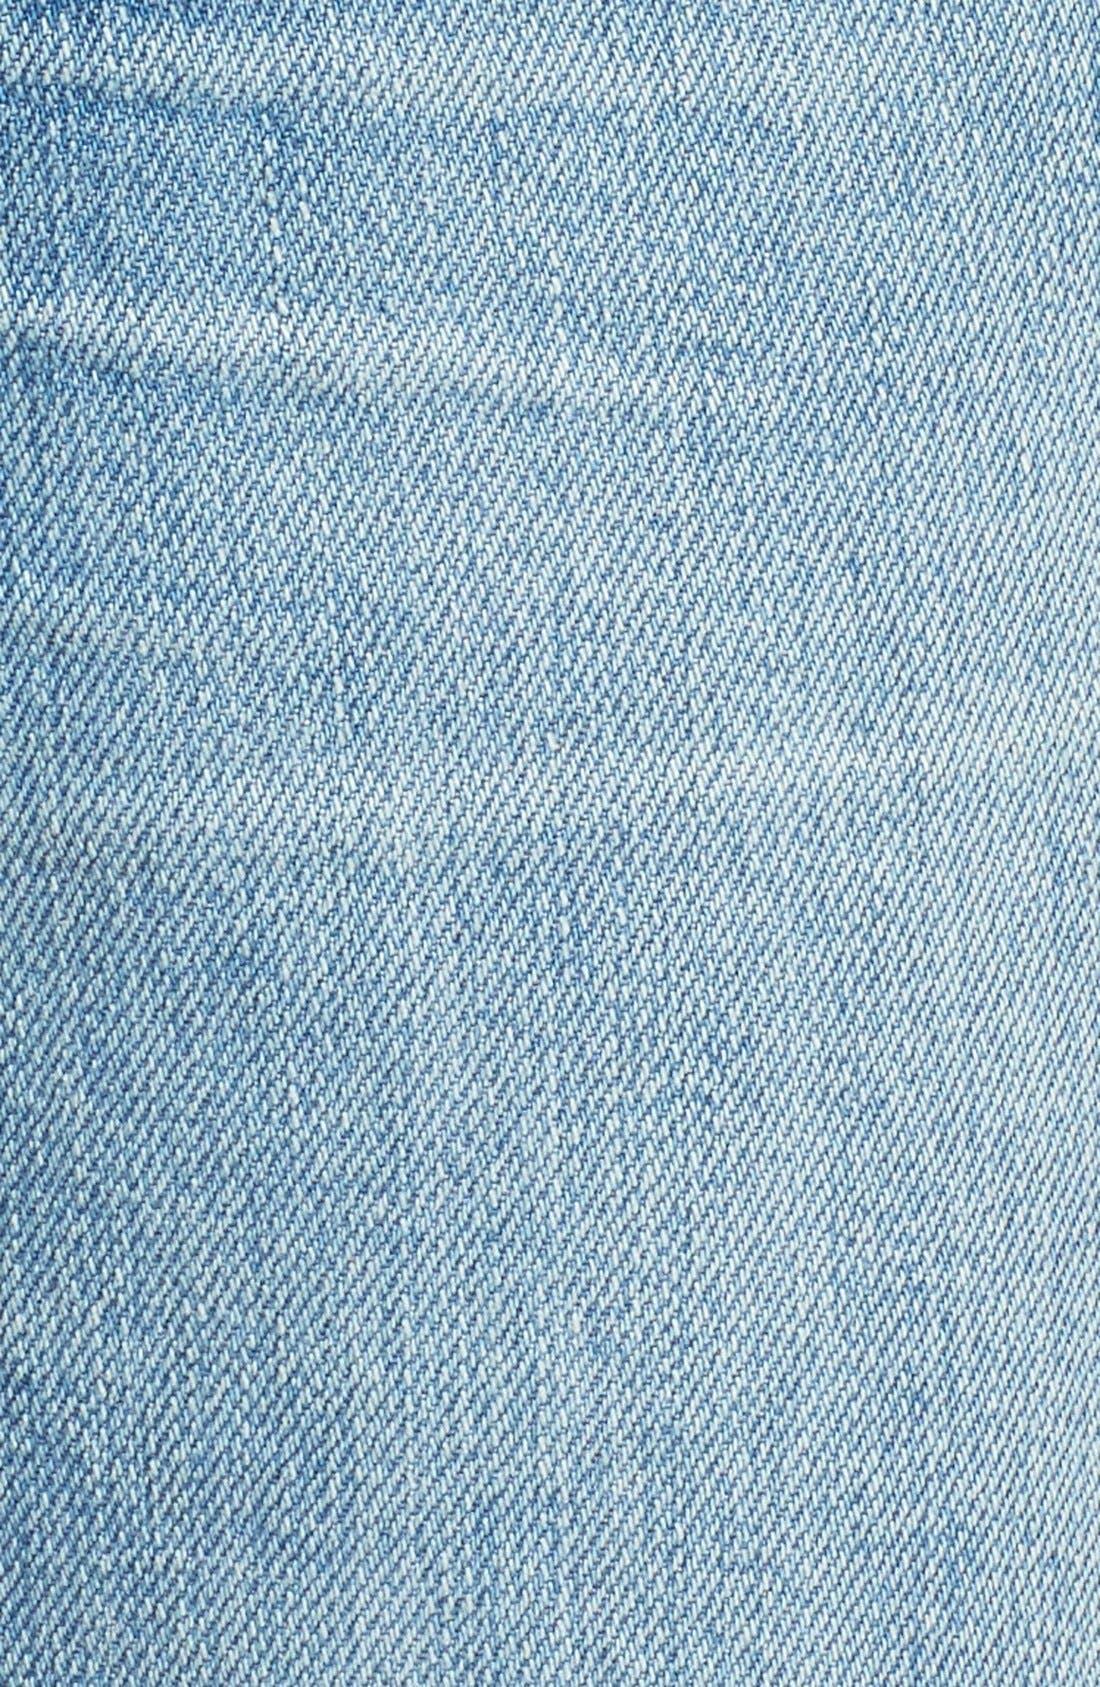 Alternate Image 5  - Madewell Perfect Vintage Ripped High Waist Boyfriend Jeans (Chet)